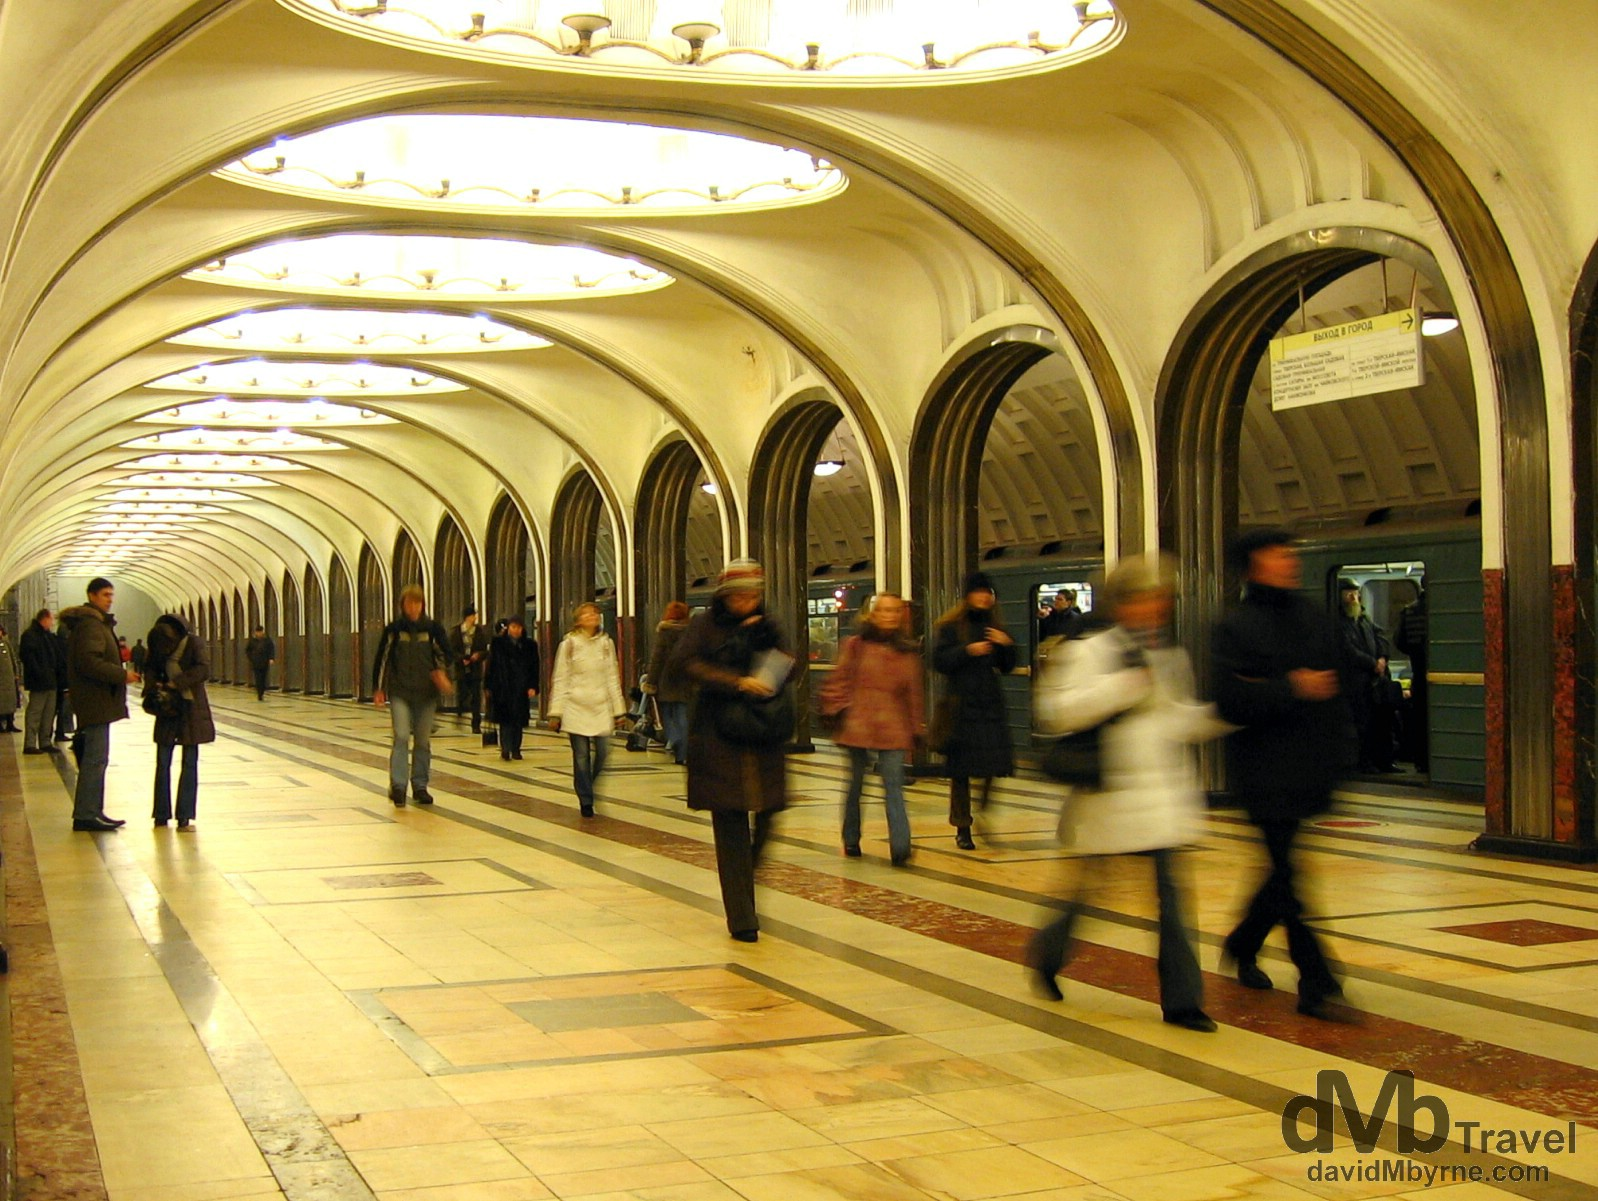 Mayakovskaya metro station. Moscow, Russia. February 25, 2006.